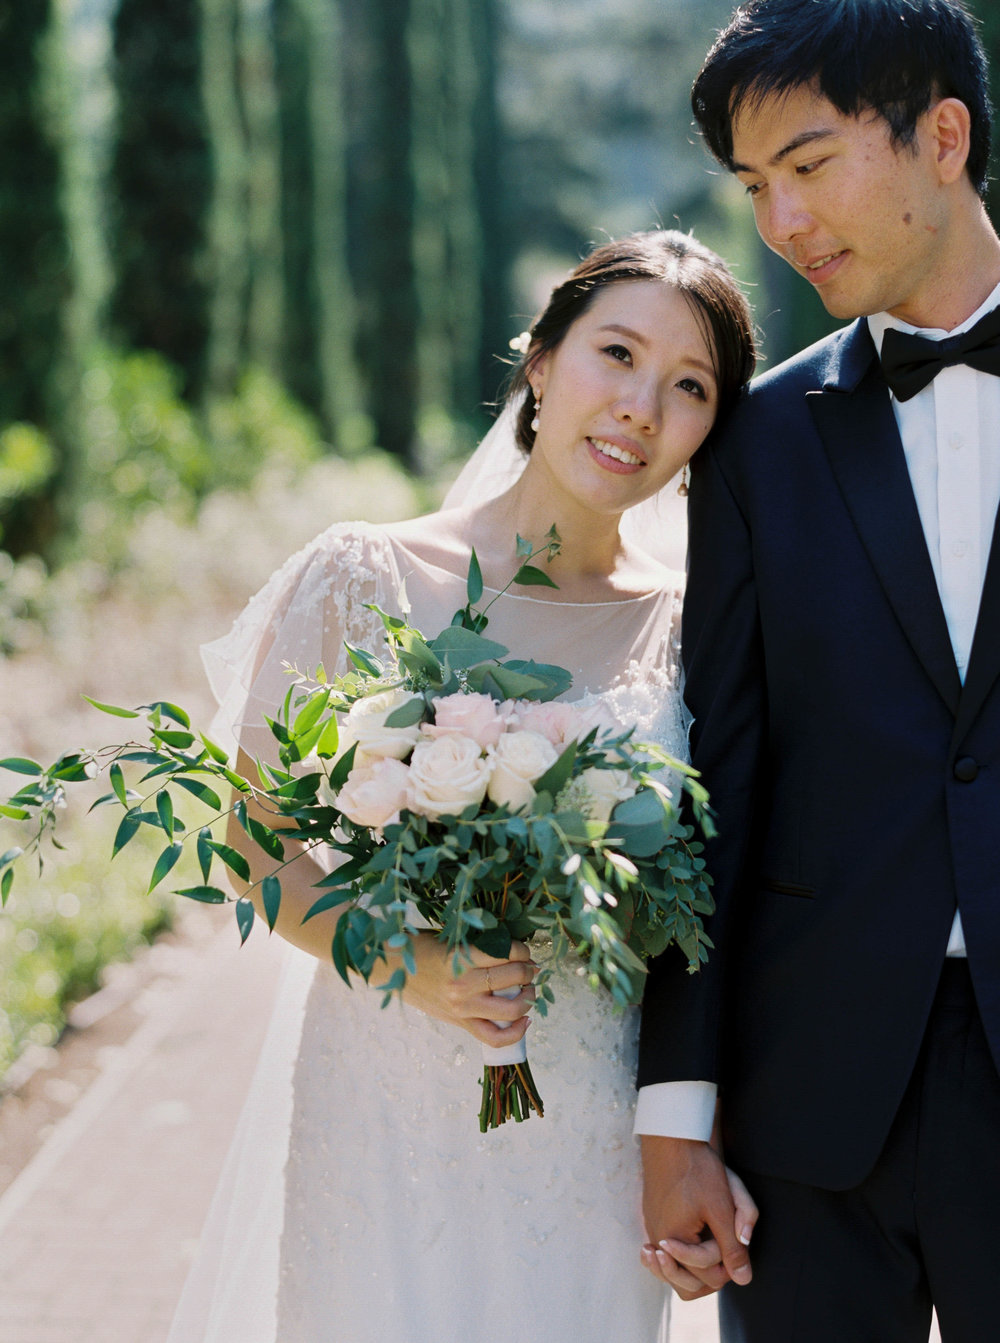 Villa_Montalvo_Wedding_Photographer_Videographer_San_Francisco078.jpg